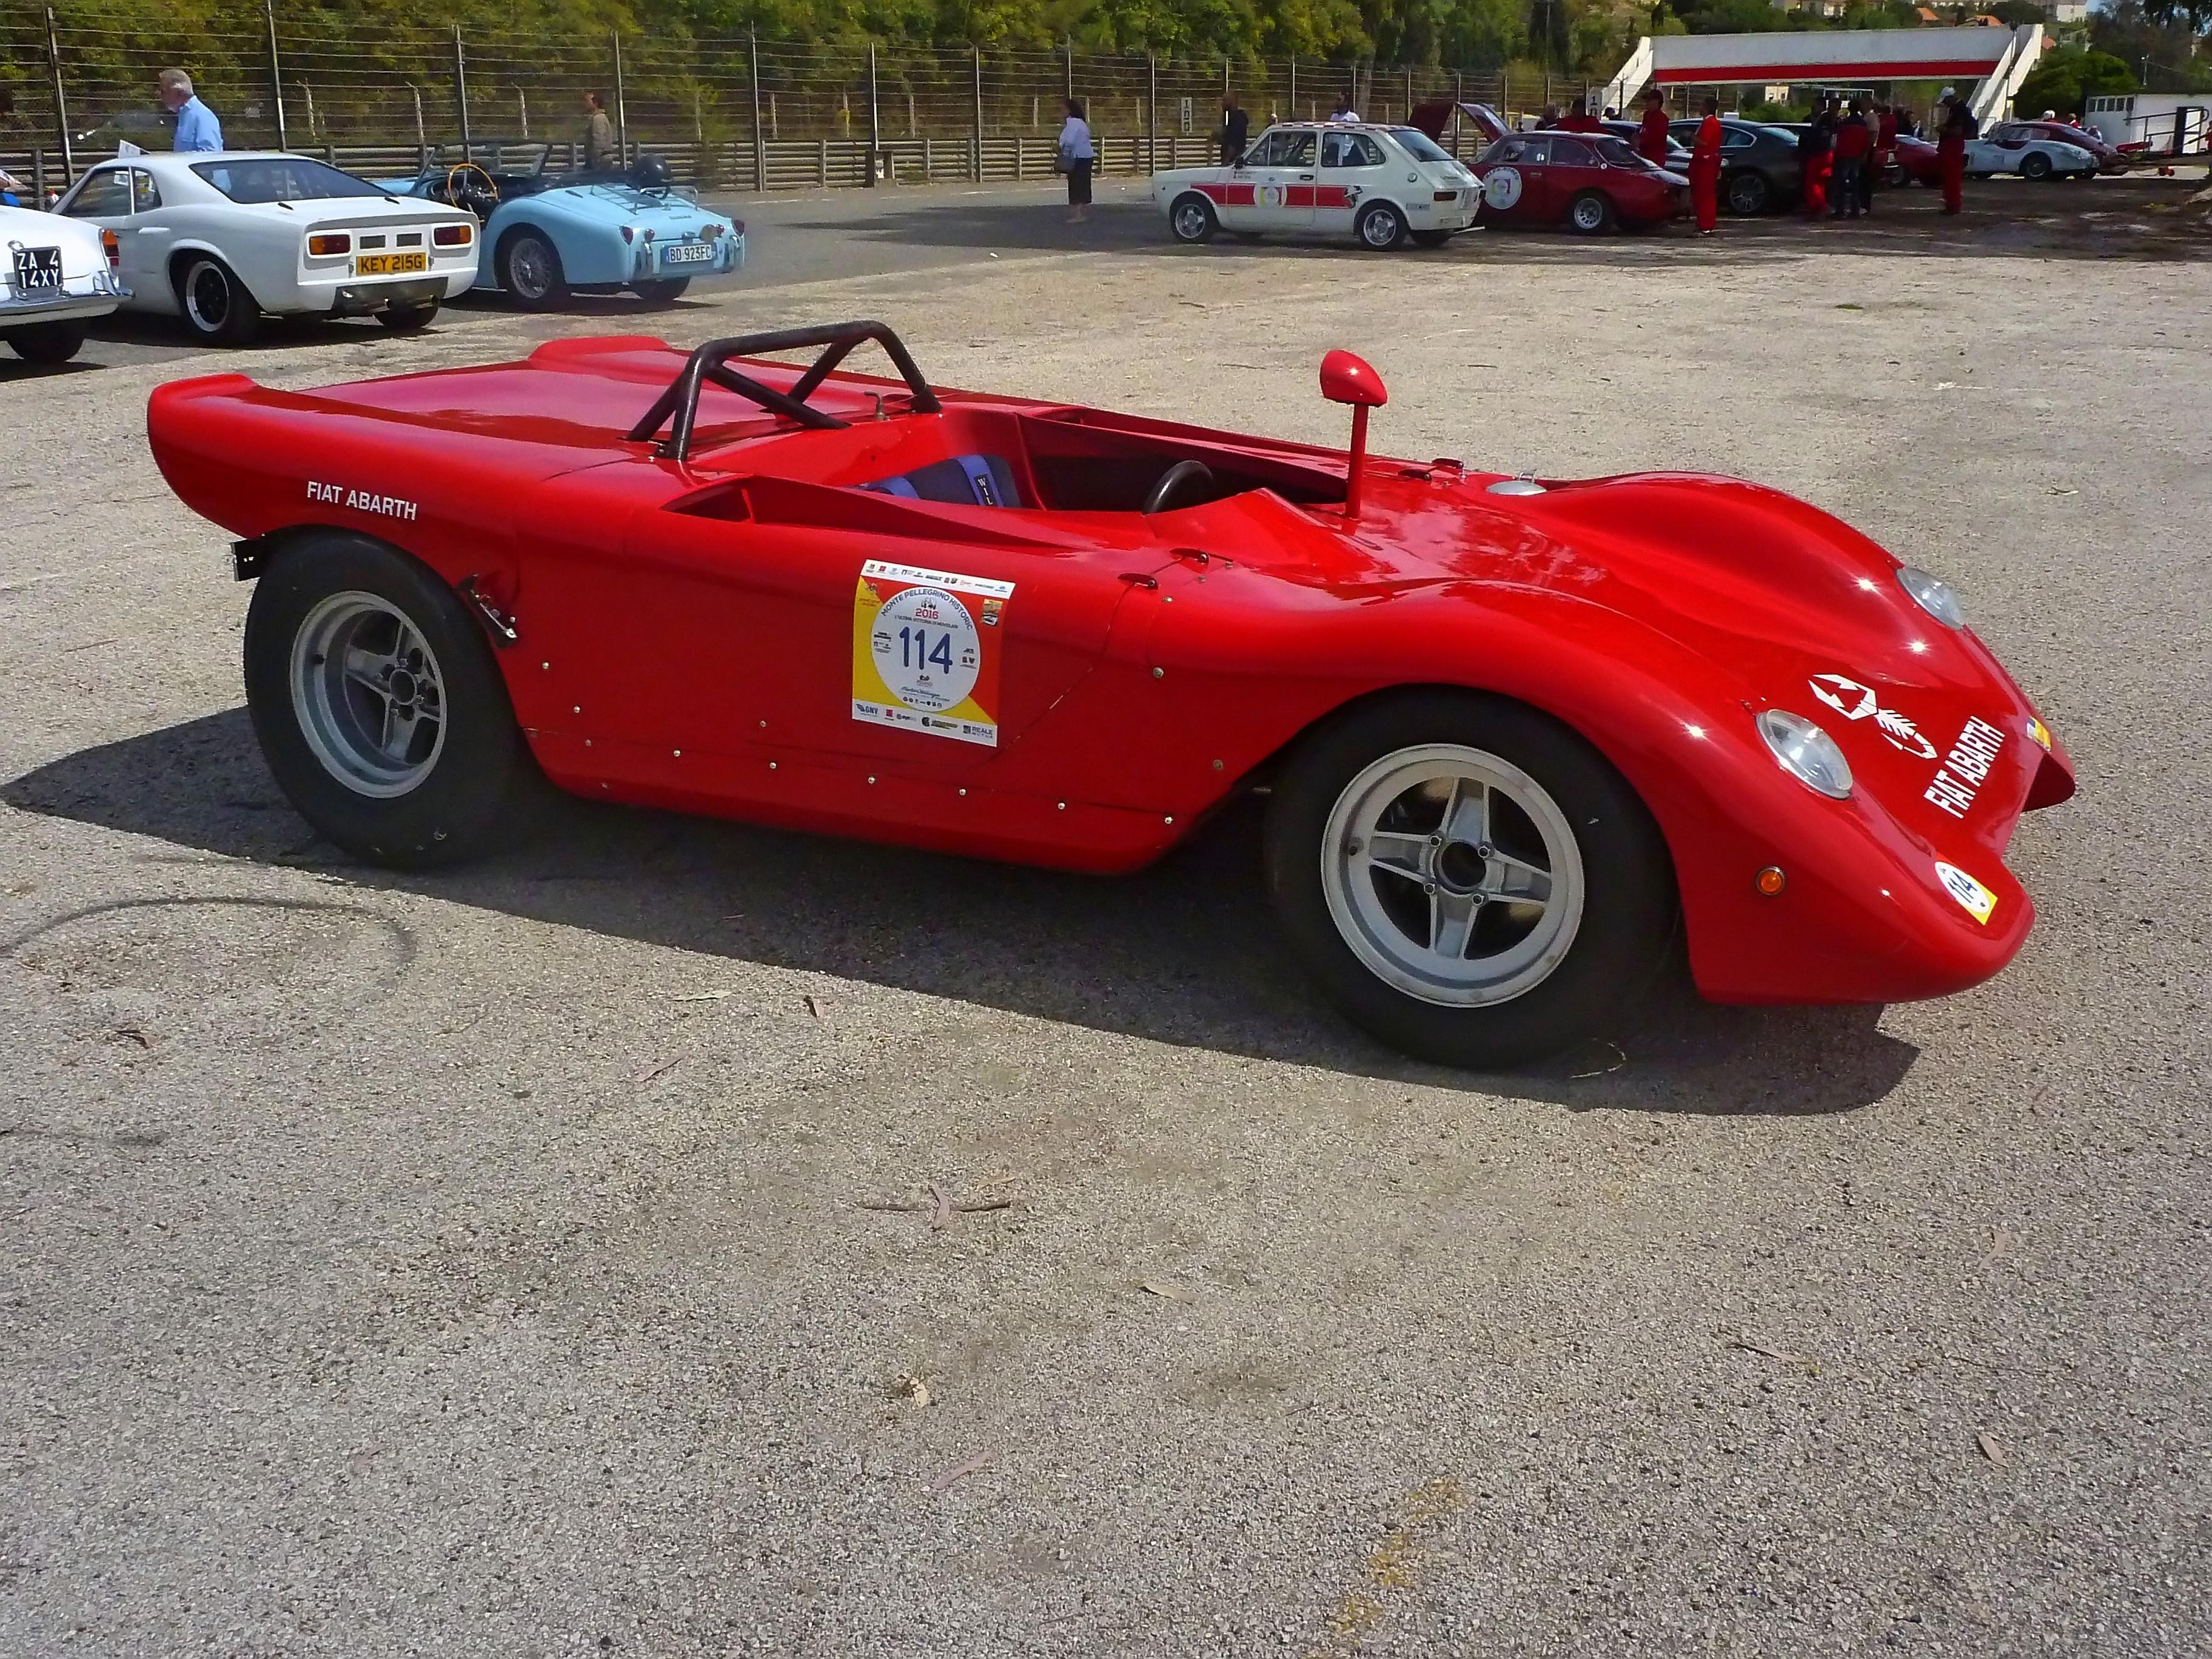 1971 Abarth 1300 SE 018 Biposto Cuneo (12)